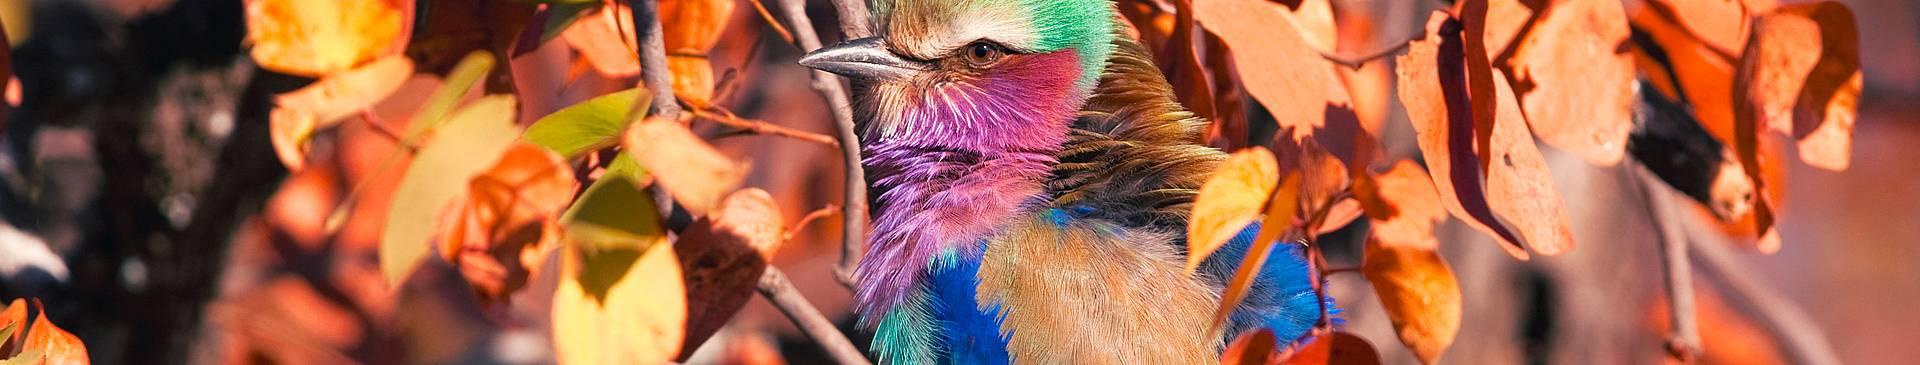 Bird watching in South Africa